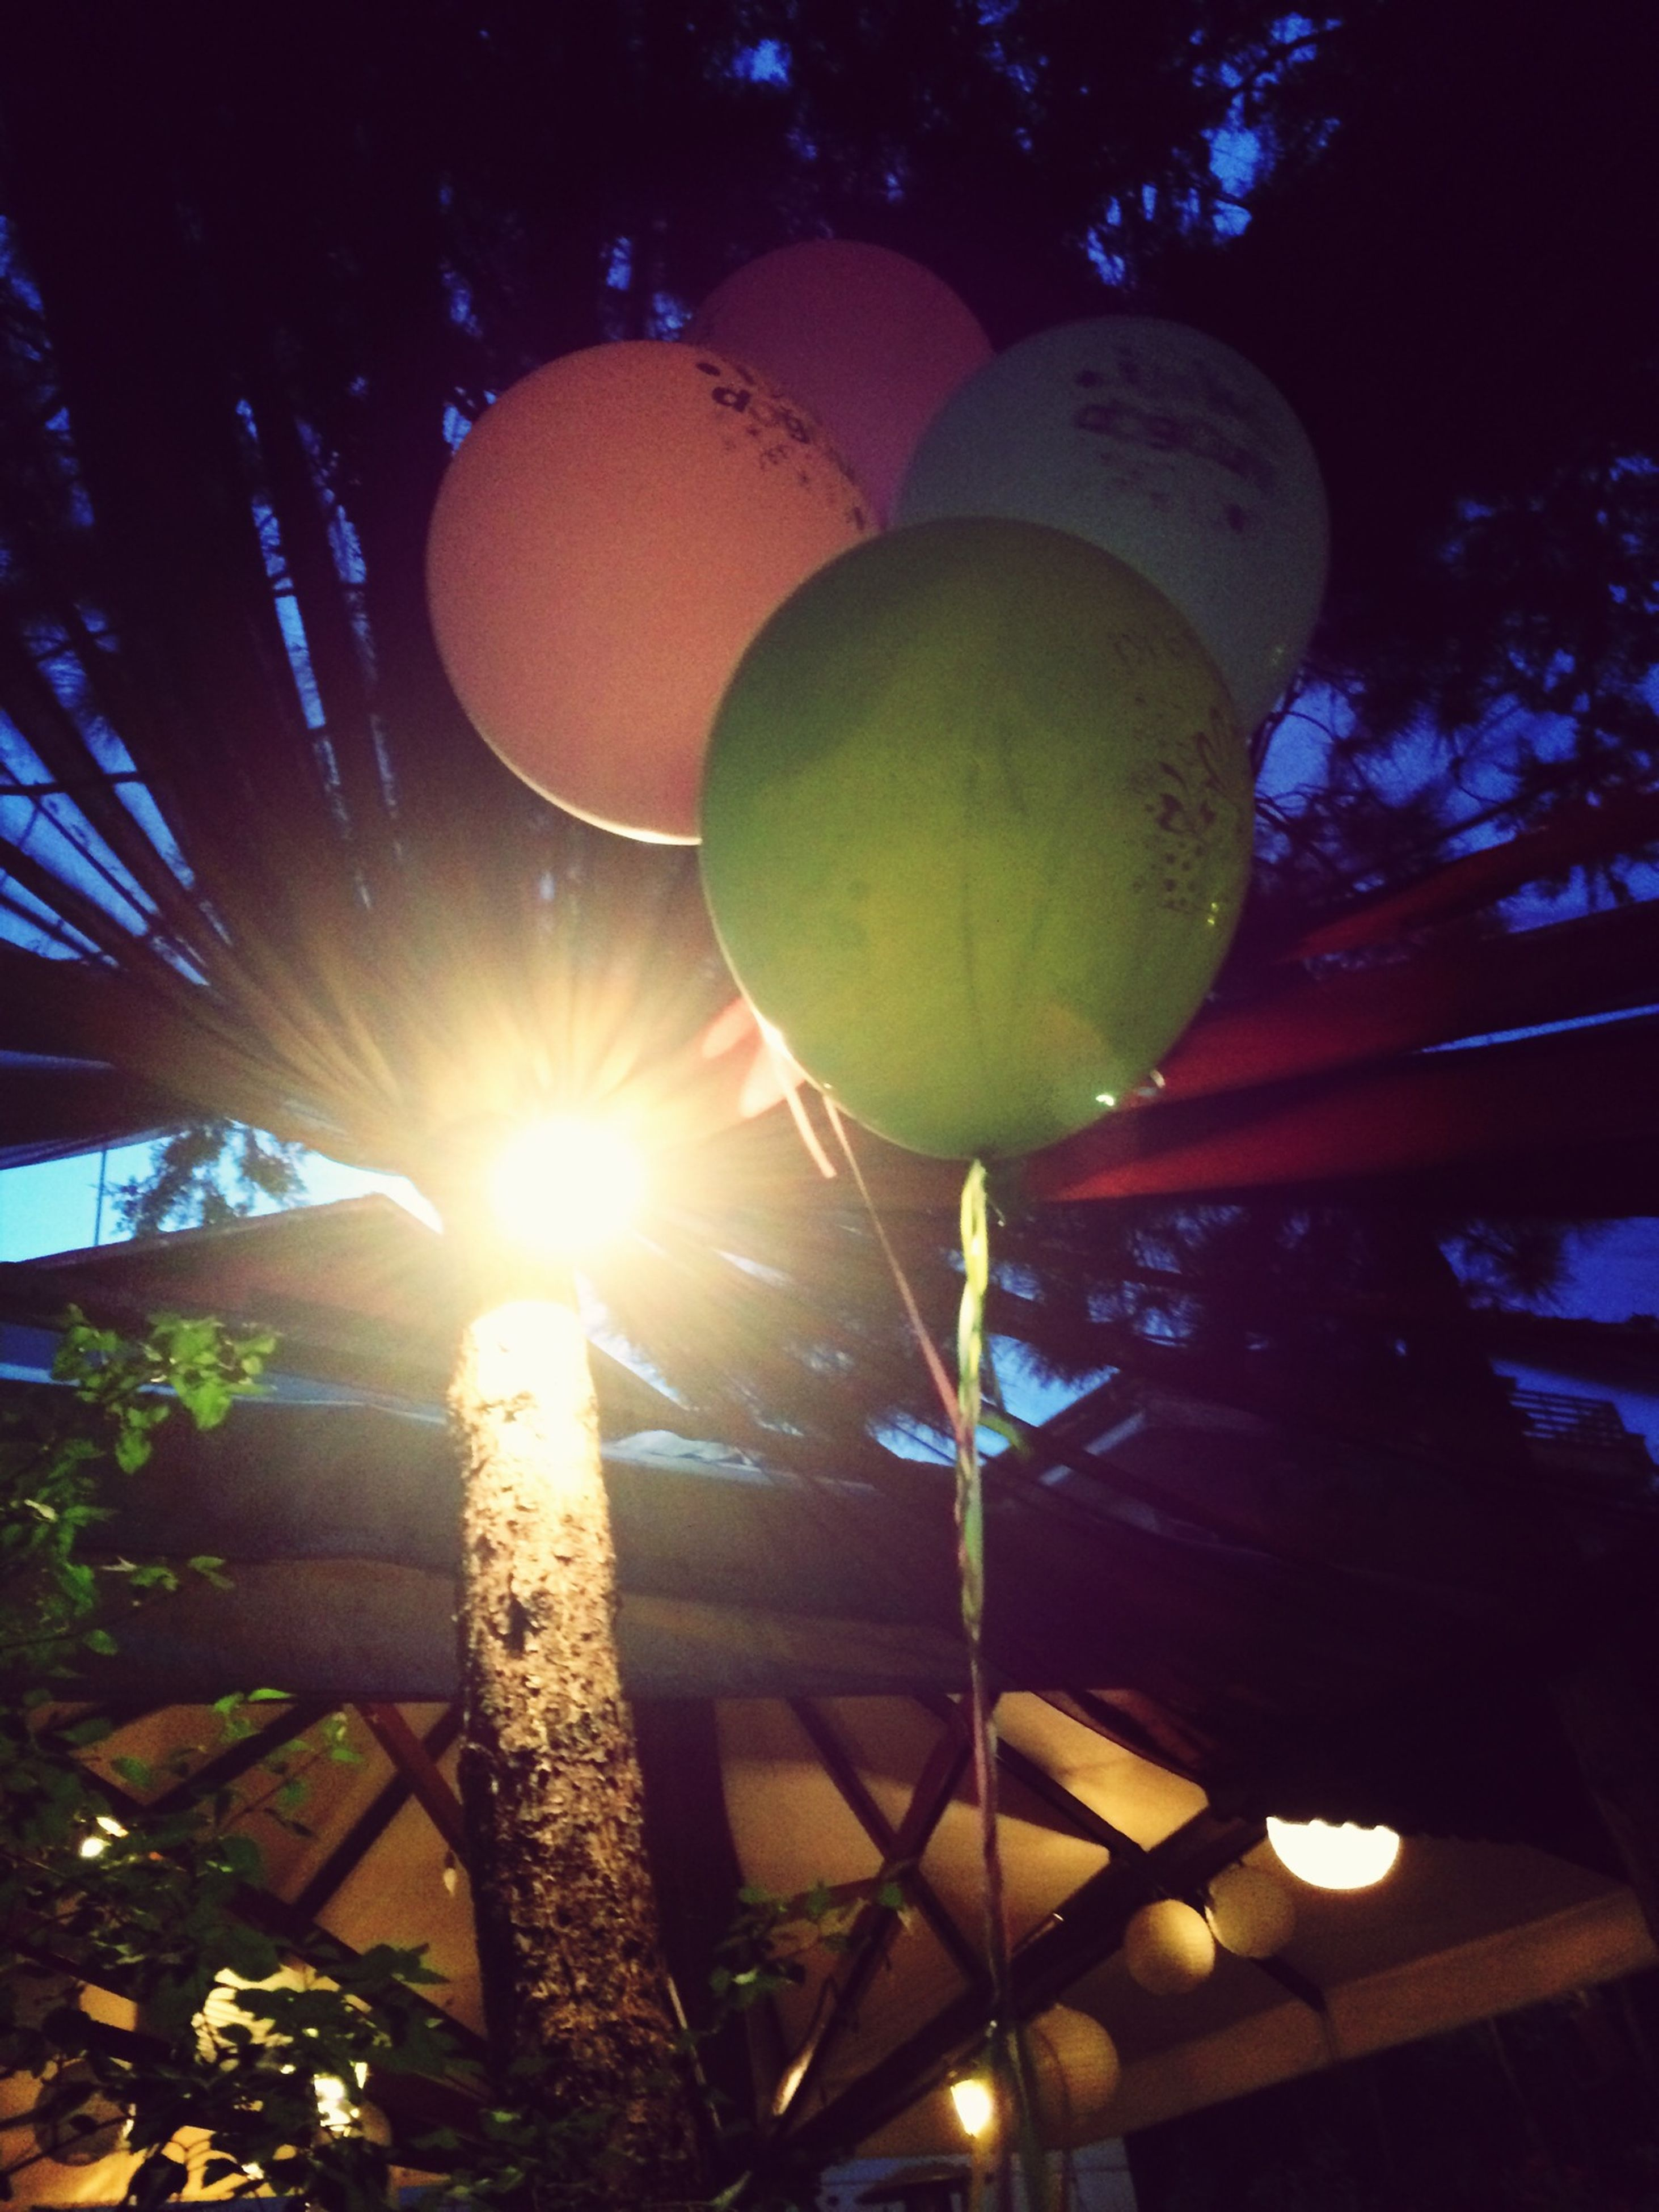 low angle view, illuminated, lighting equipment, tree, hanging, electricity, night, decoration, branch, electric light, glowing, light bulb, electric lamp, light - natural phenomenon, sunlight, street light, no people, sphere, lantern, growth